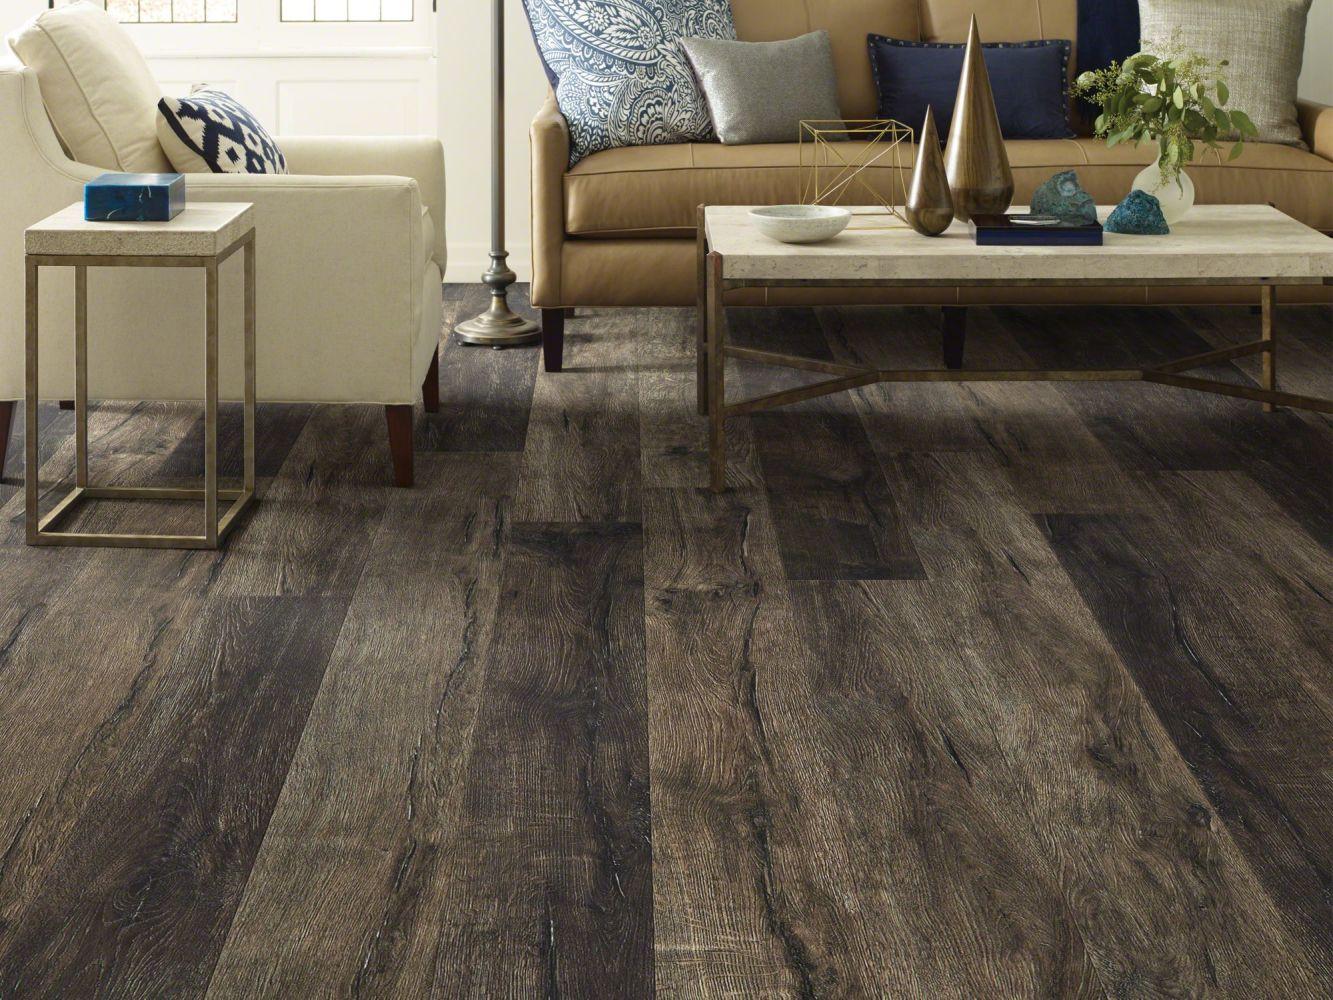 Shaw Floors Resilient Residential Alto HD Plus Torino 00793_2731V